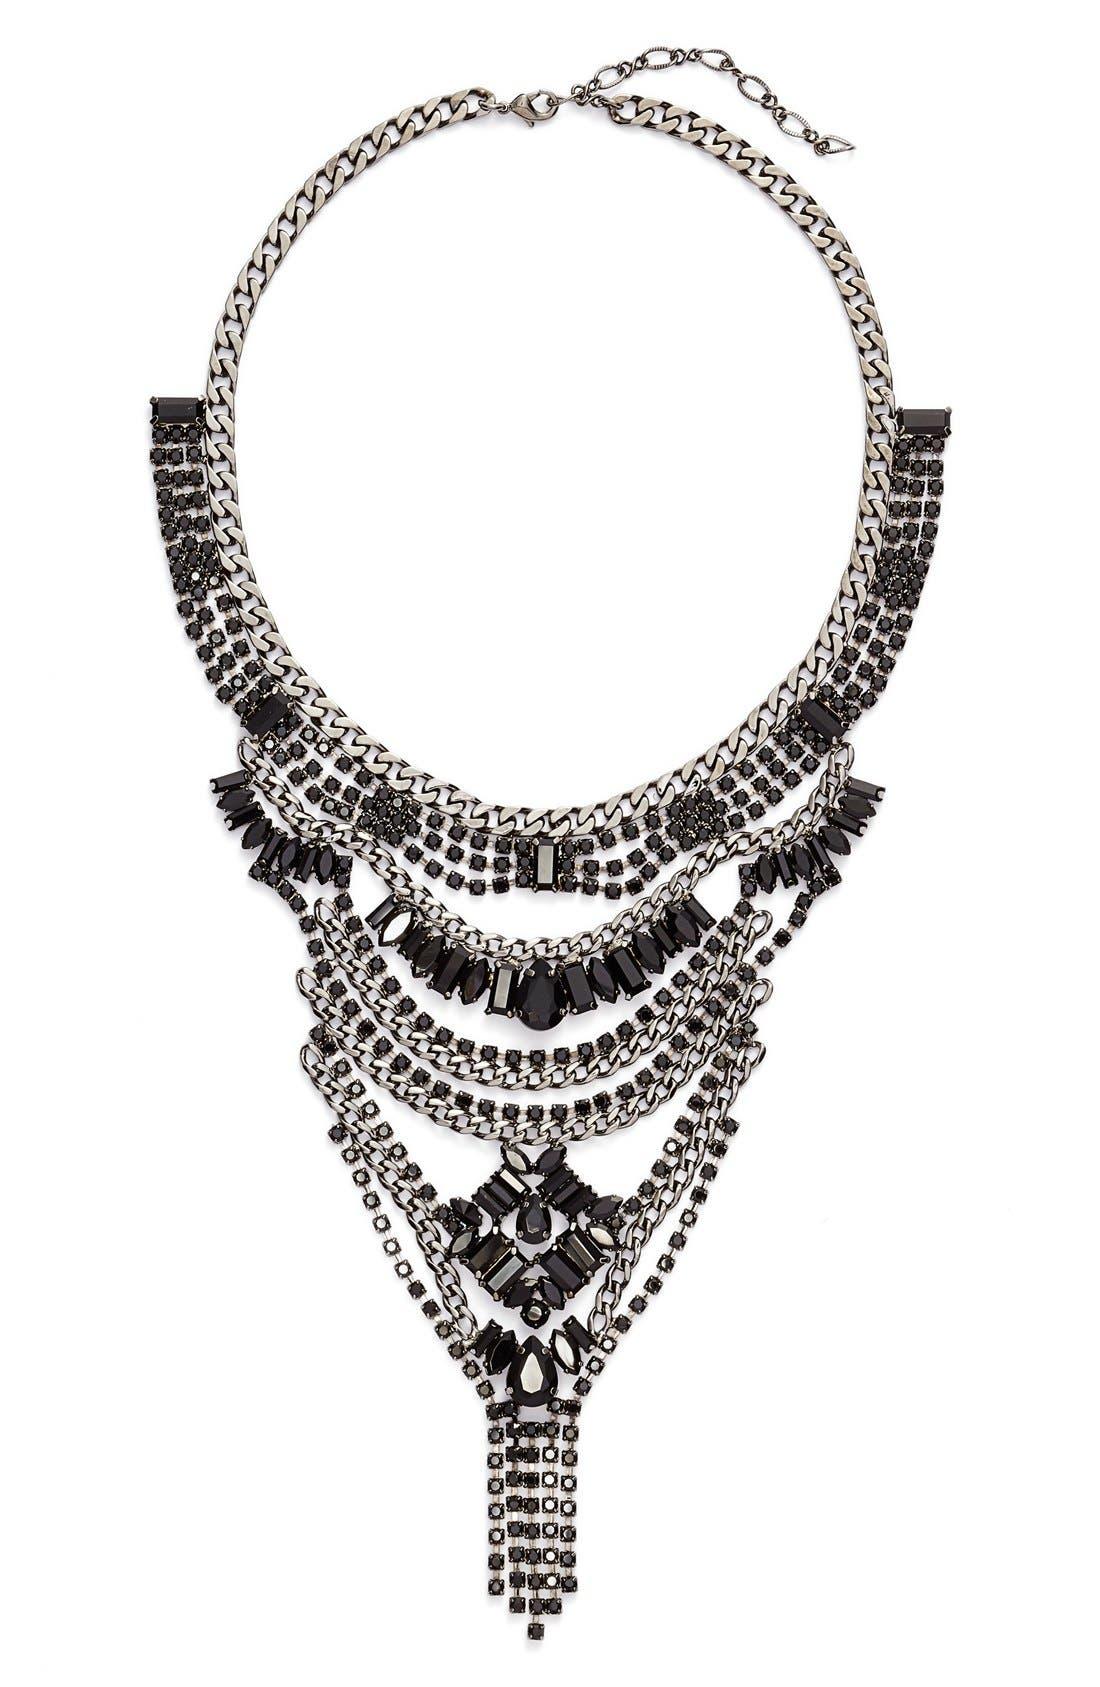 Main Image - Cristabelle Multilayered Crystal Bib Necklace